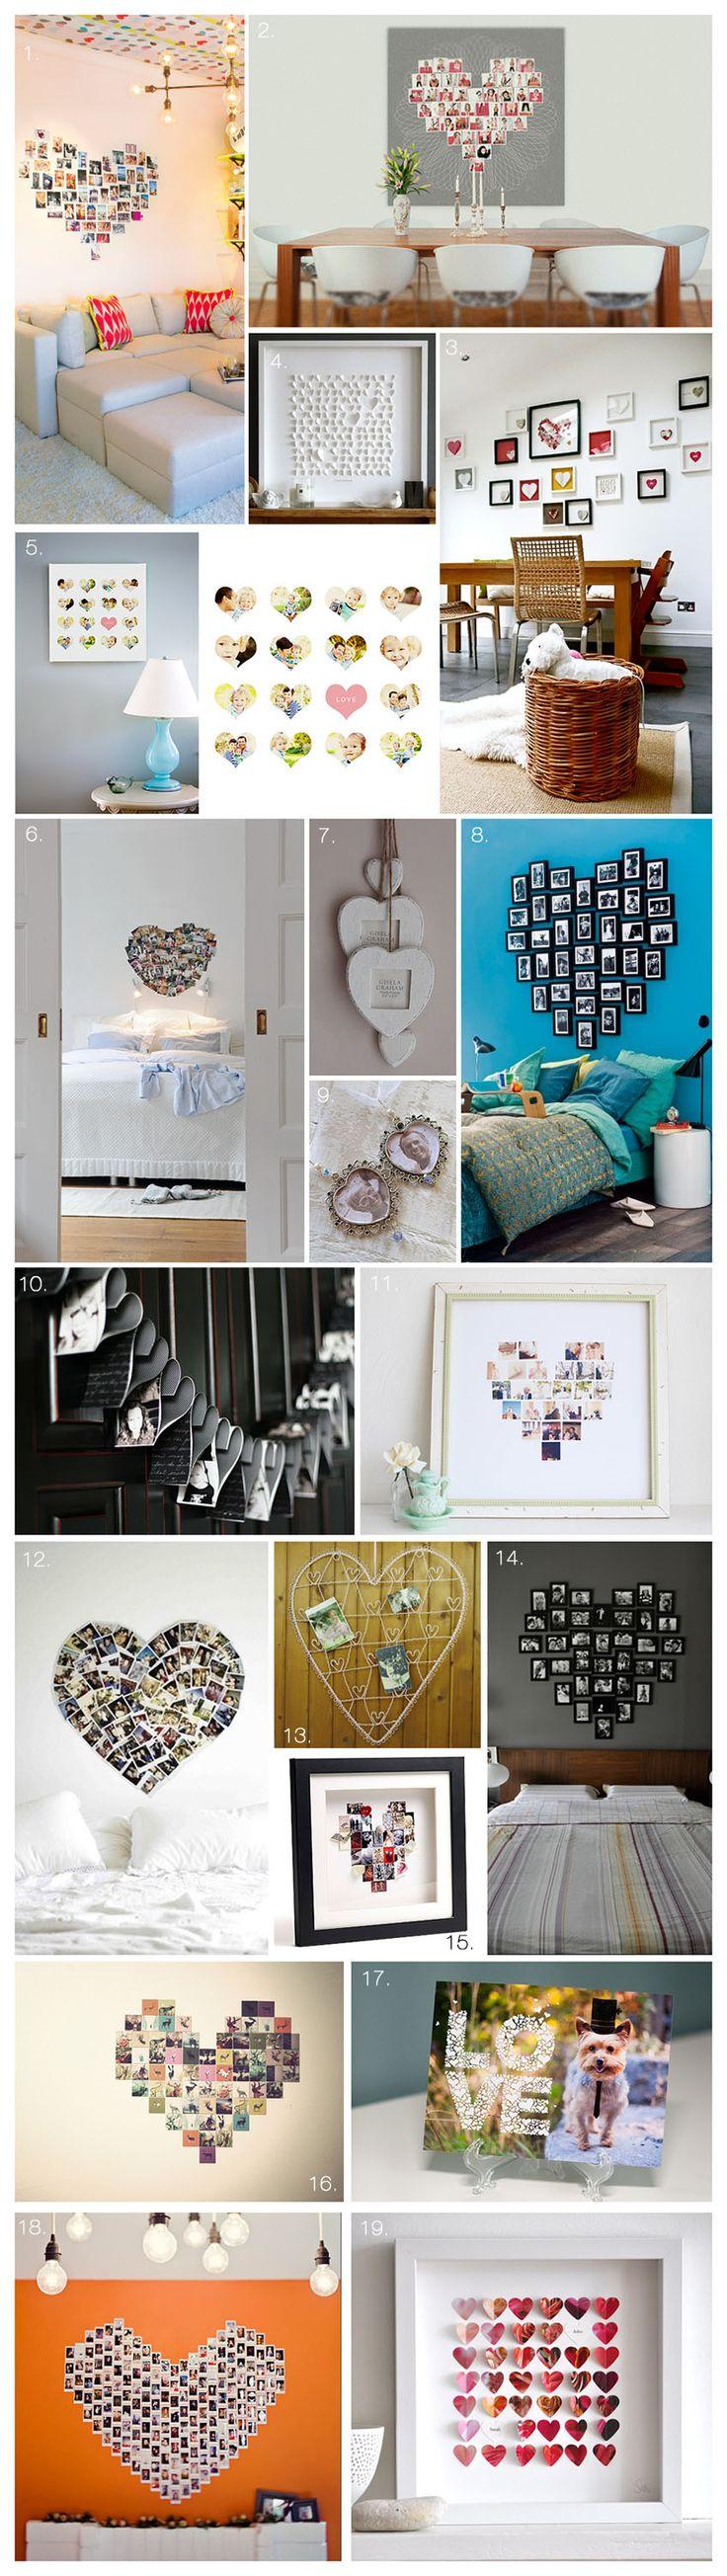 Heart Shaped Photo Wall Displays | Akemi Photography    #MemoriesOnDisplay #PhotoWall #PhotoDisplay